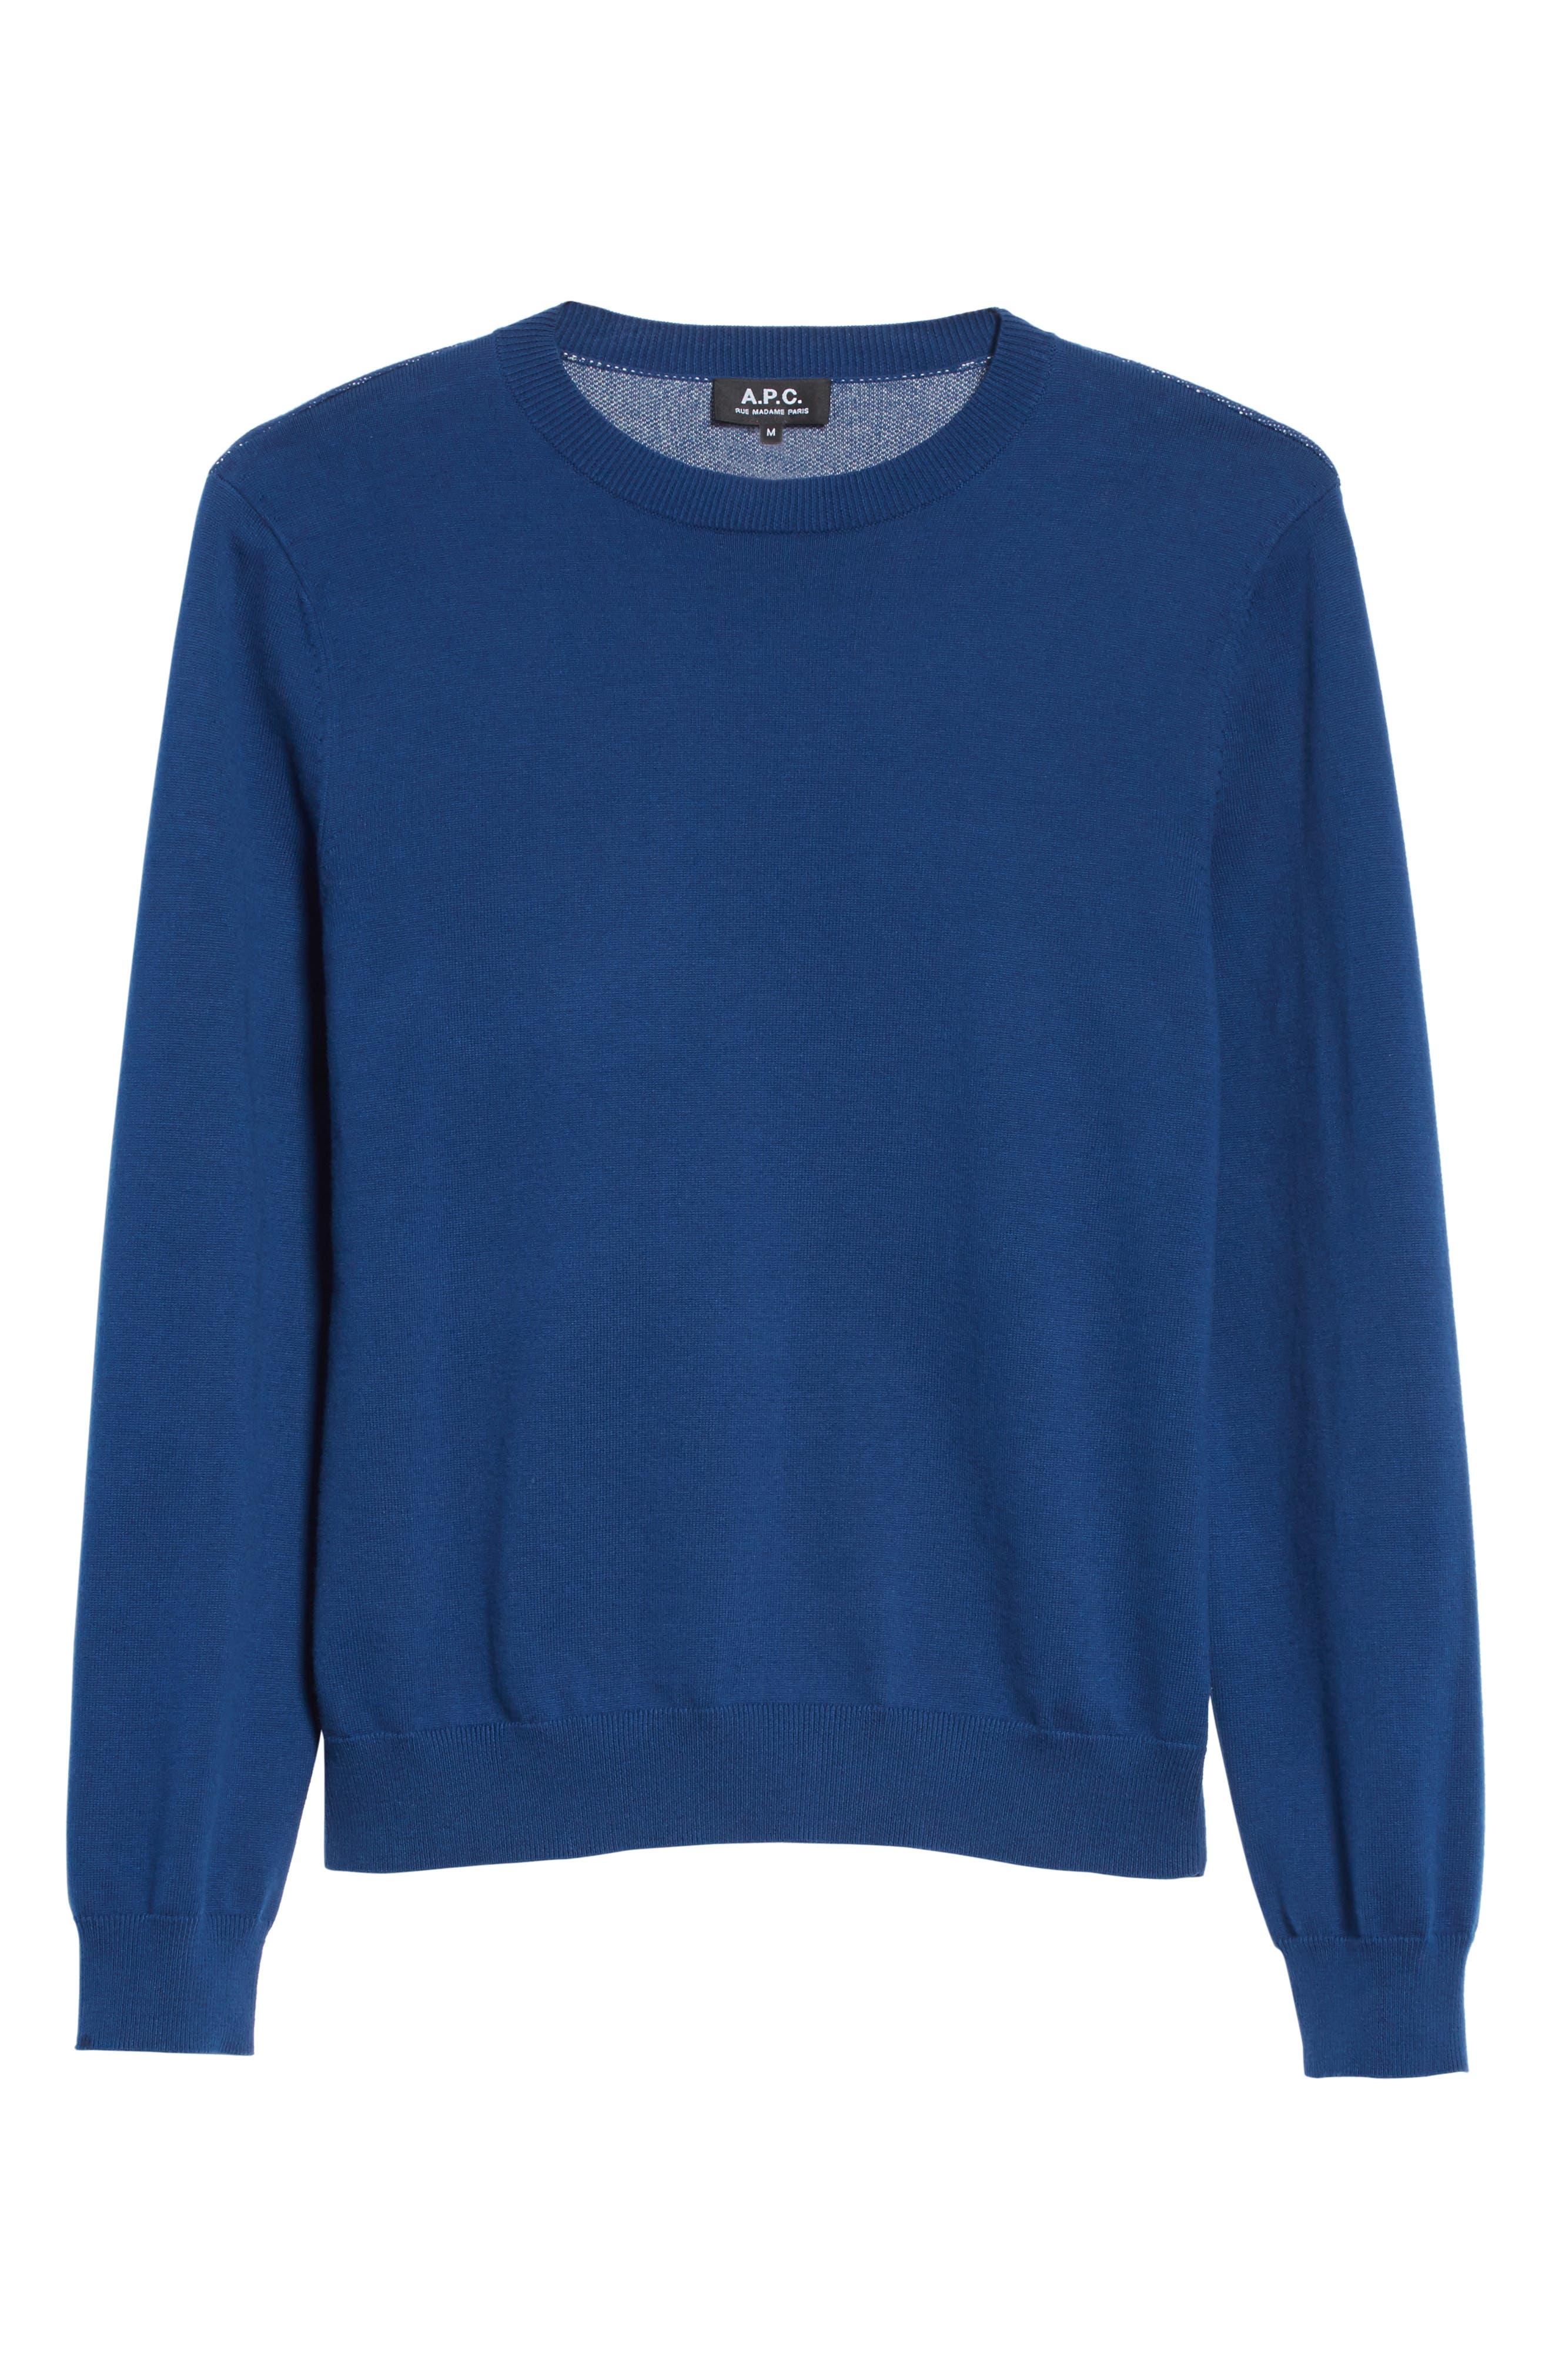 CIA Crewneck Sweater,                             Alternate thumbnail 6, color,                             Bleu Fonce Iah